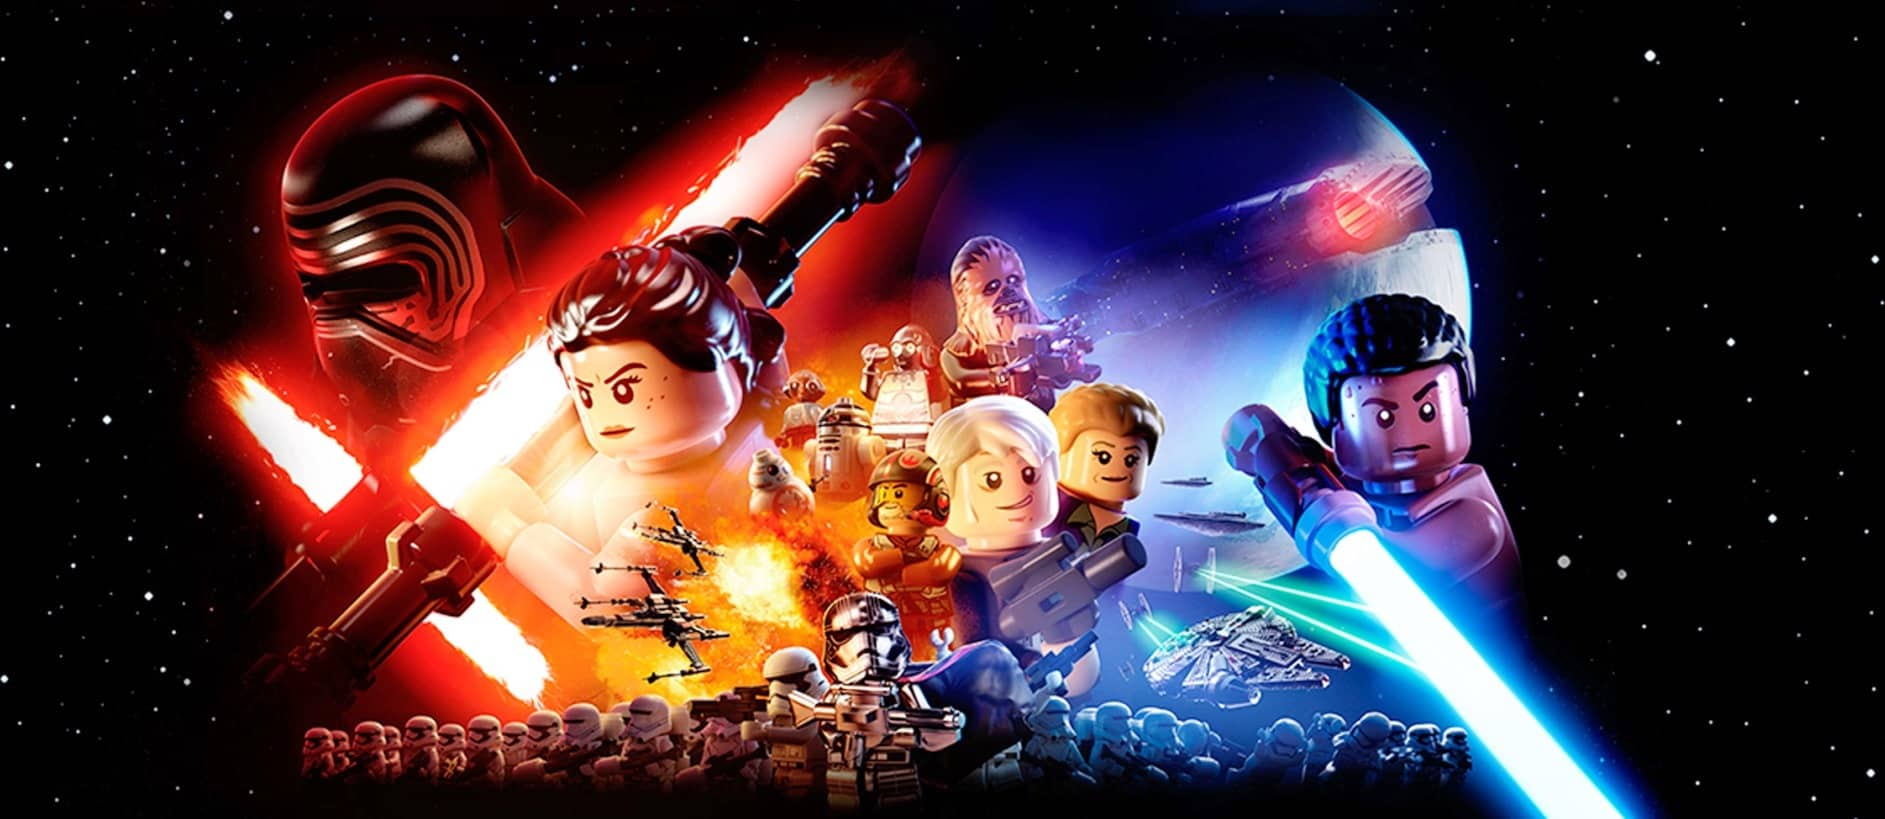 lego star wars the force awakens коды на всех персонажей